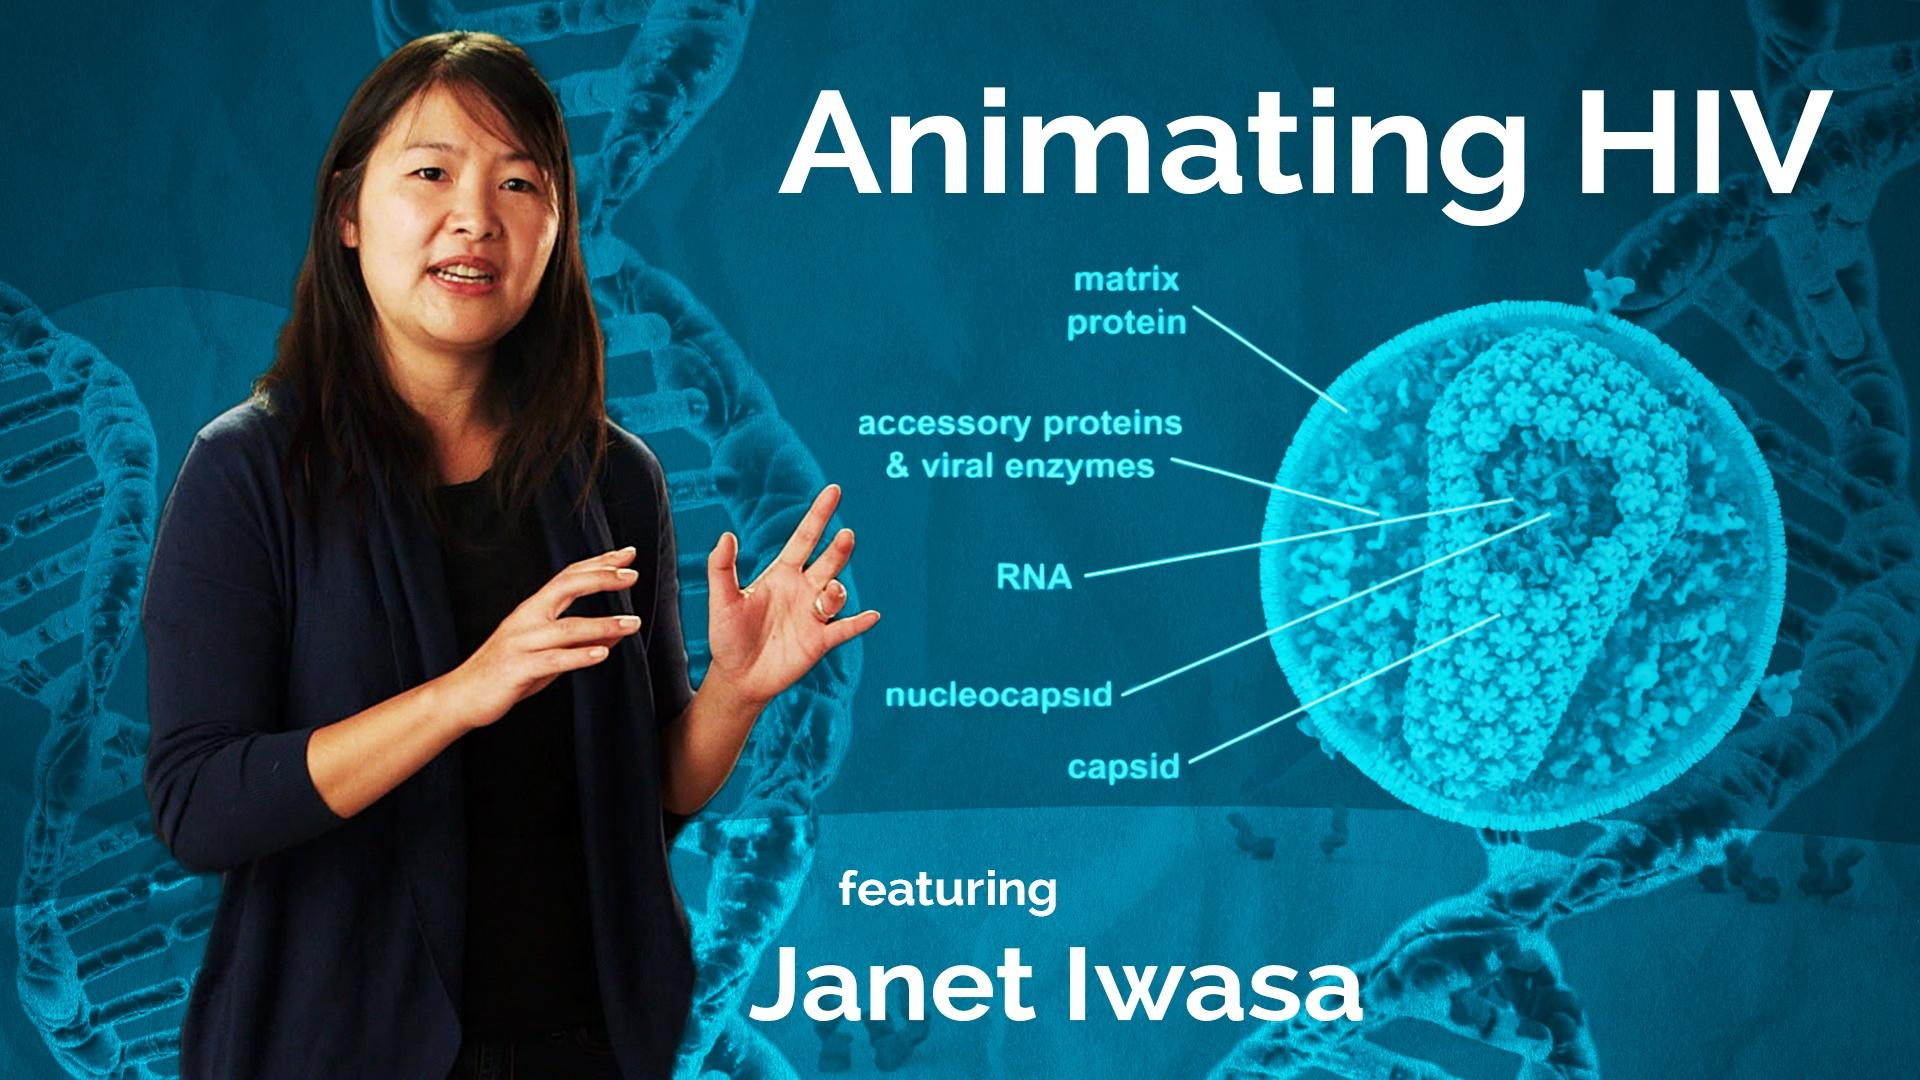 Janet Iwasa: Animating HIV Hero